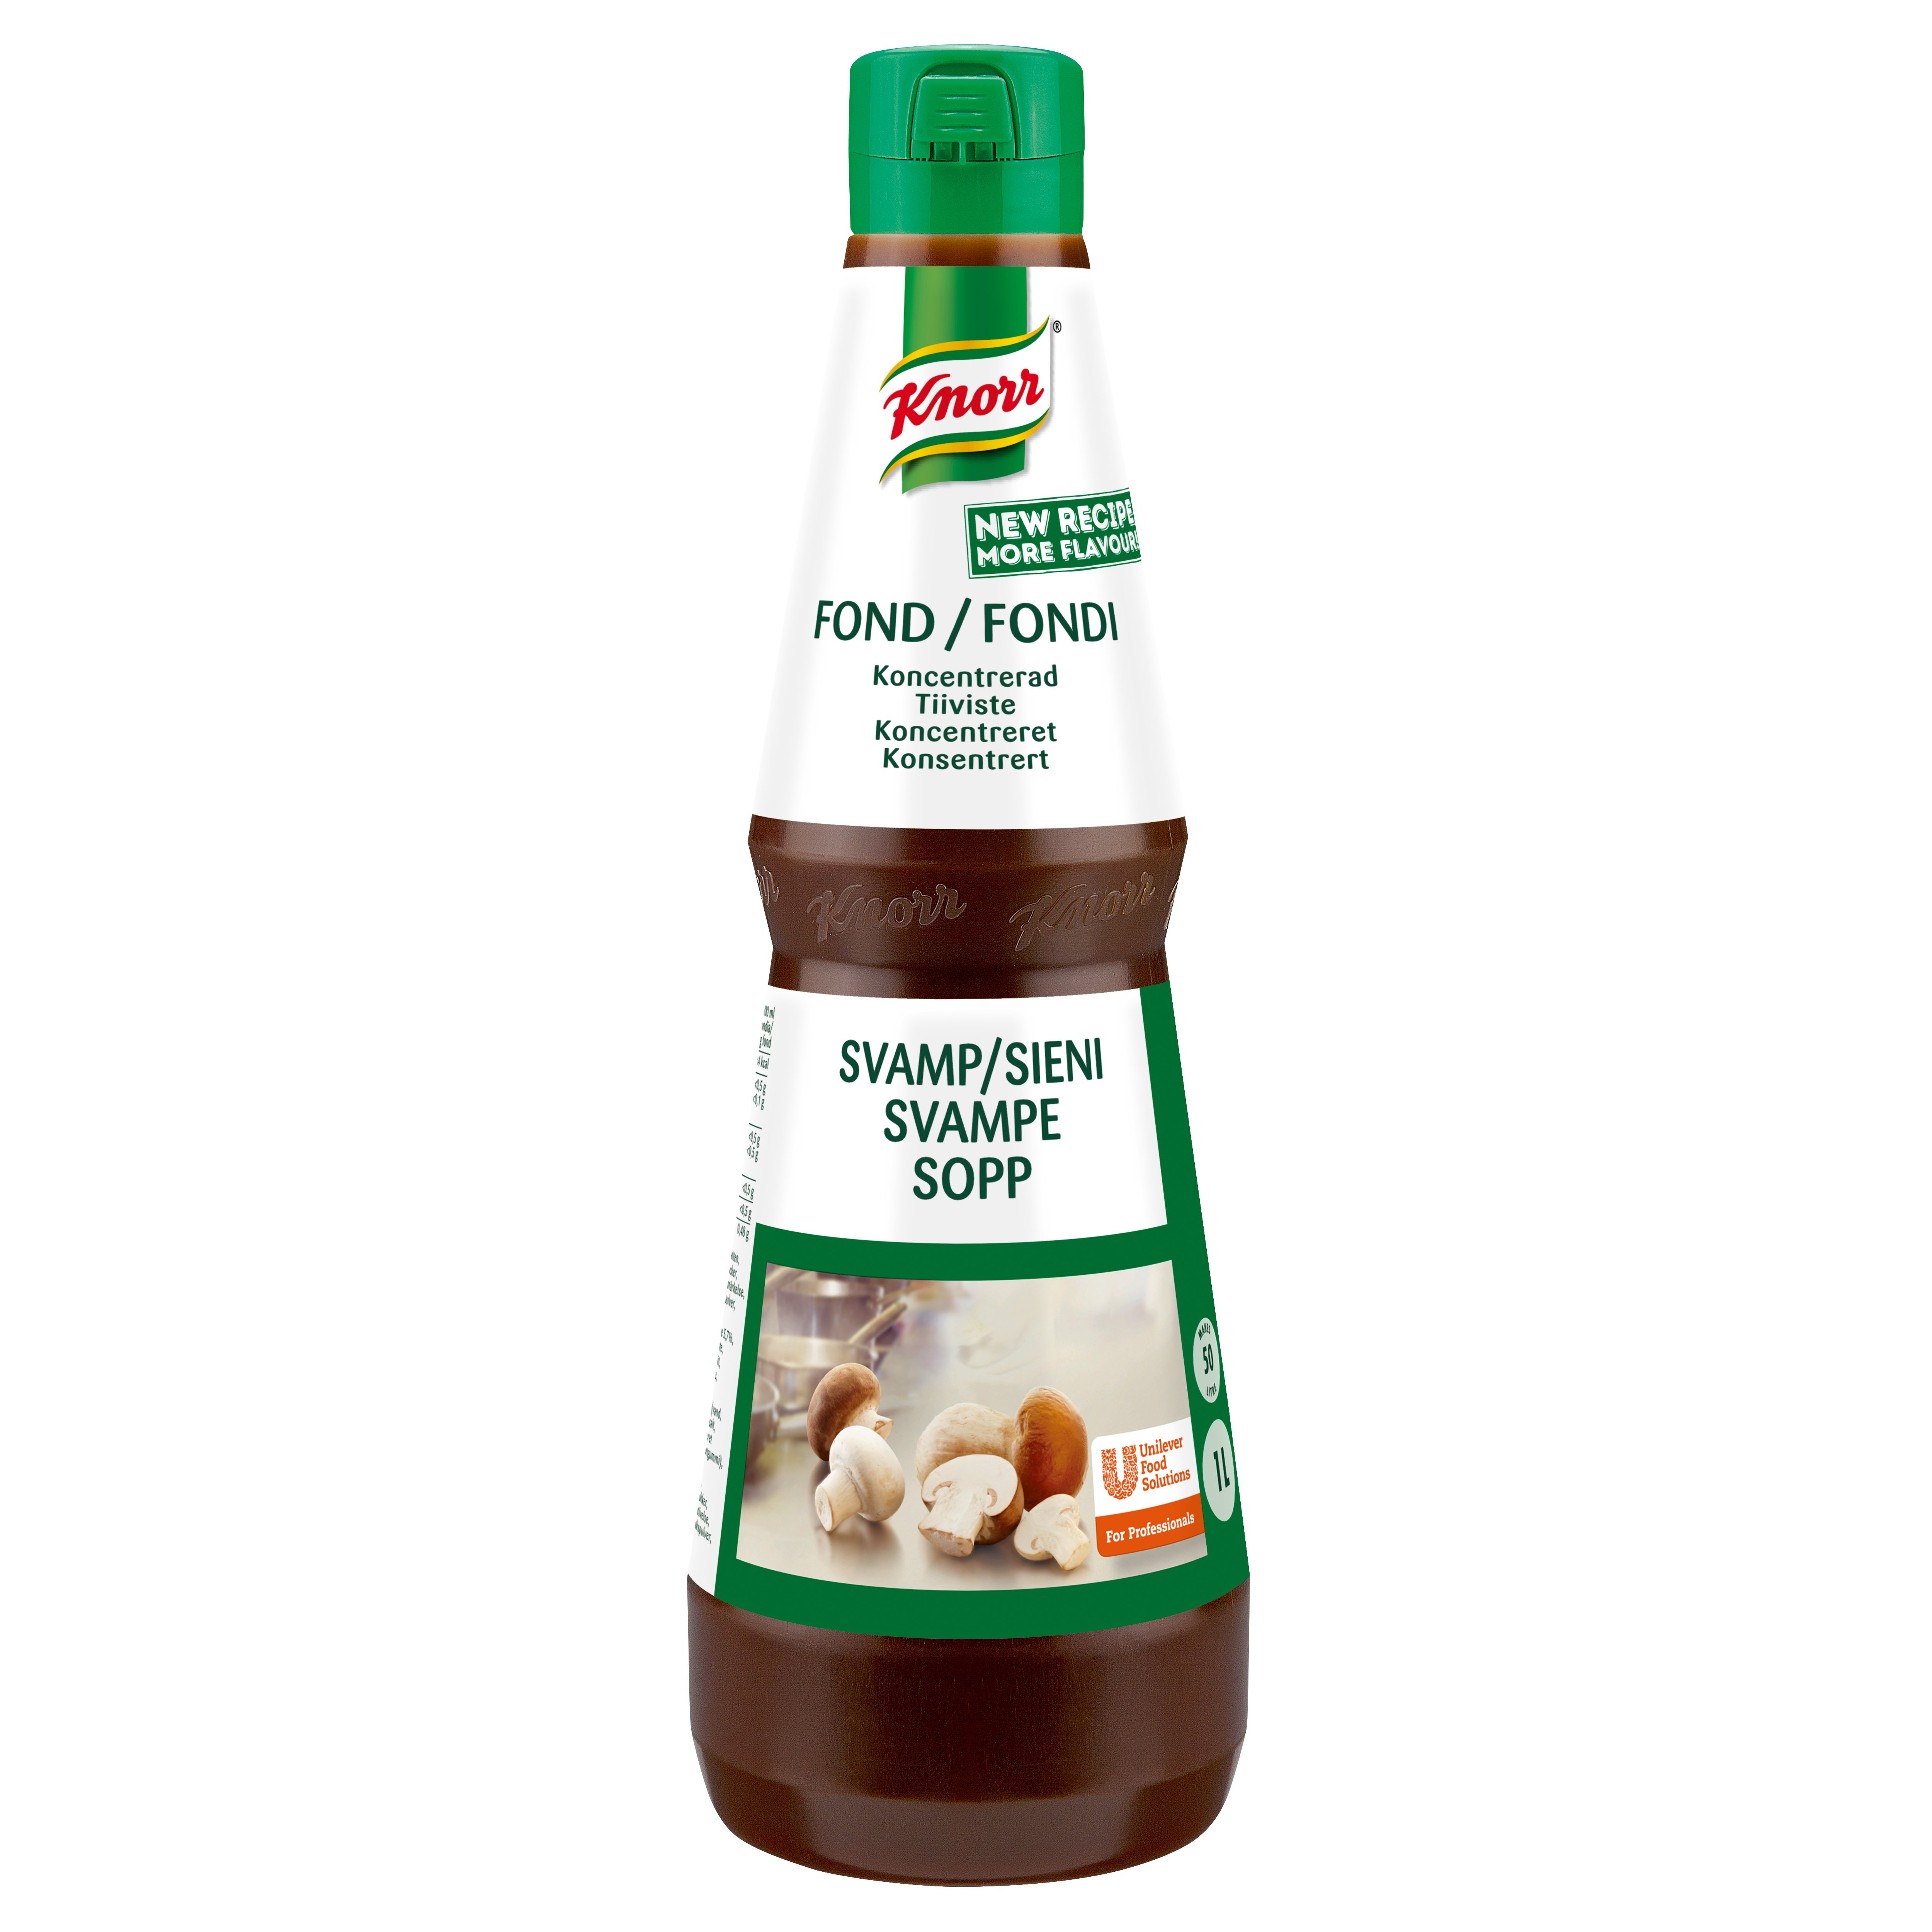 Knorr Soppfond konsentrat 50L -